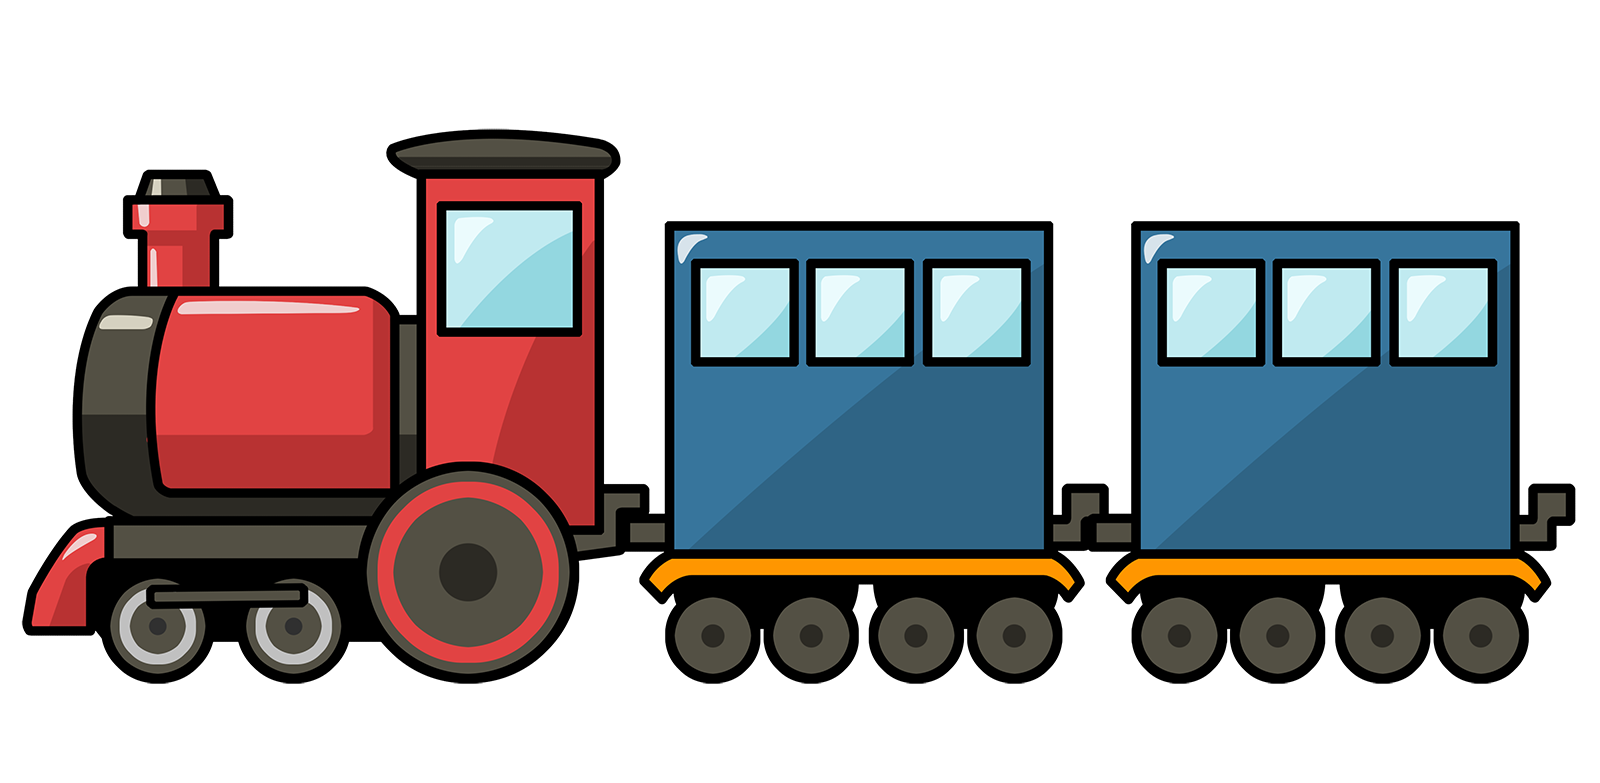 Cartoon Train.